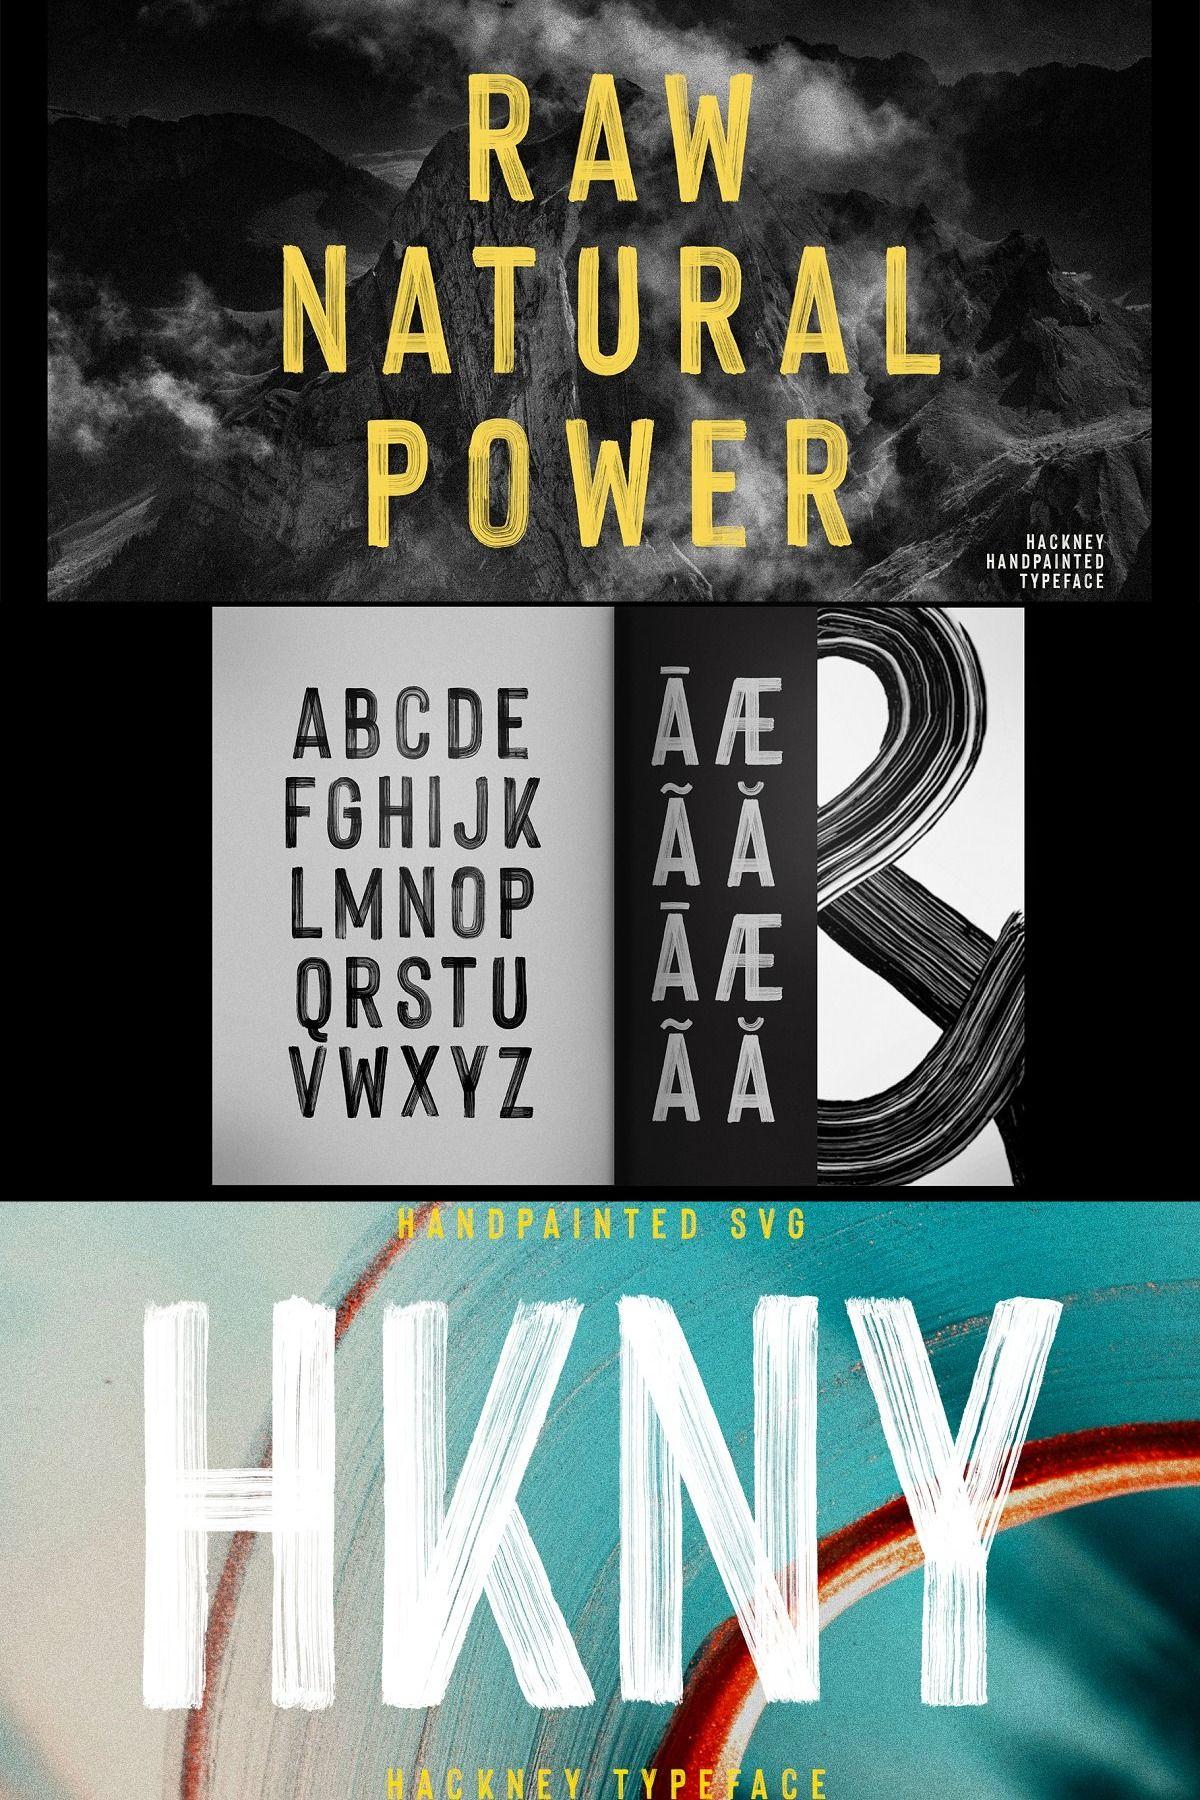 Hackney SVG Bold Handpainted Font in 2020 Lettering